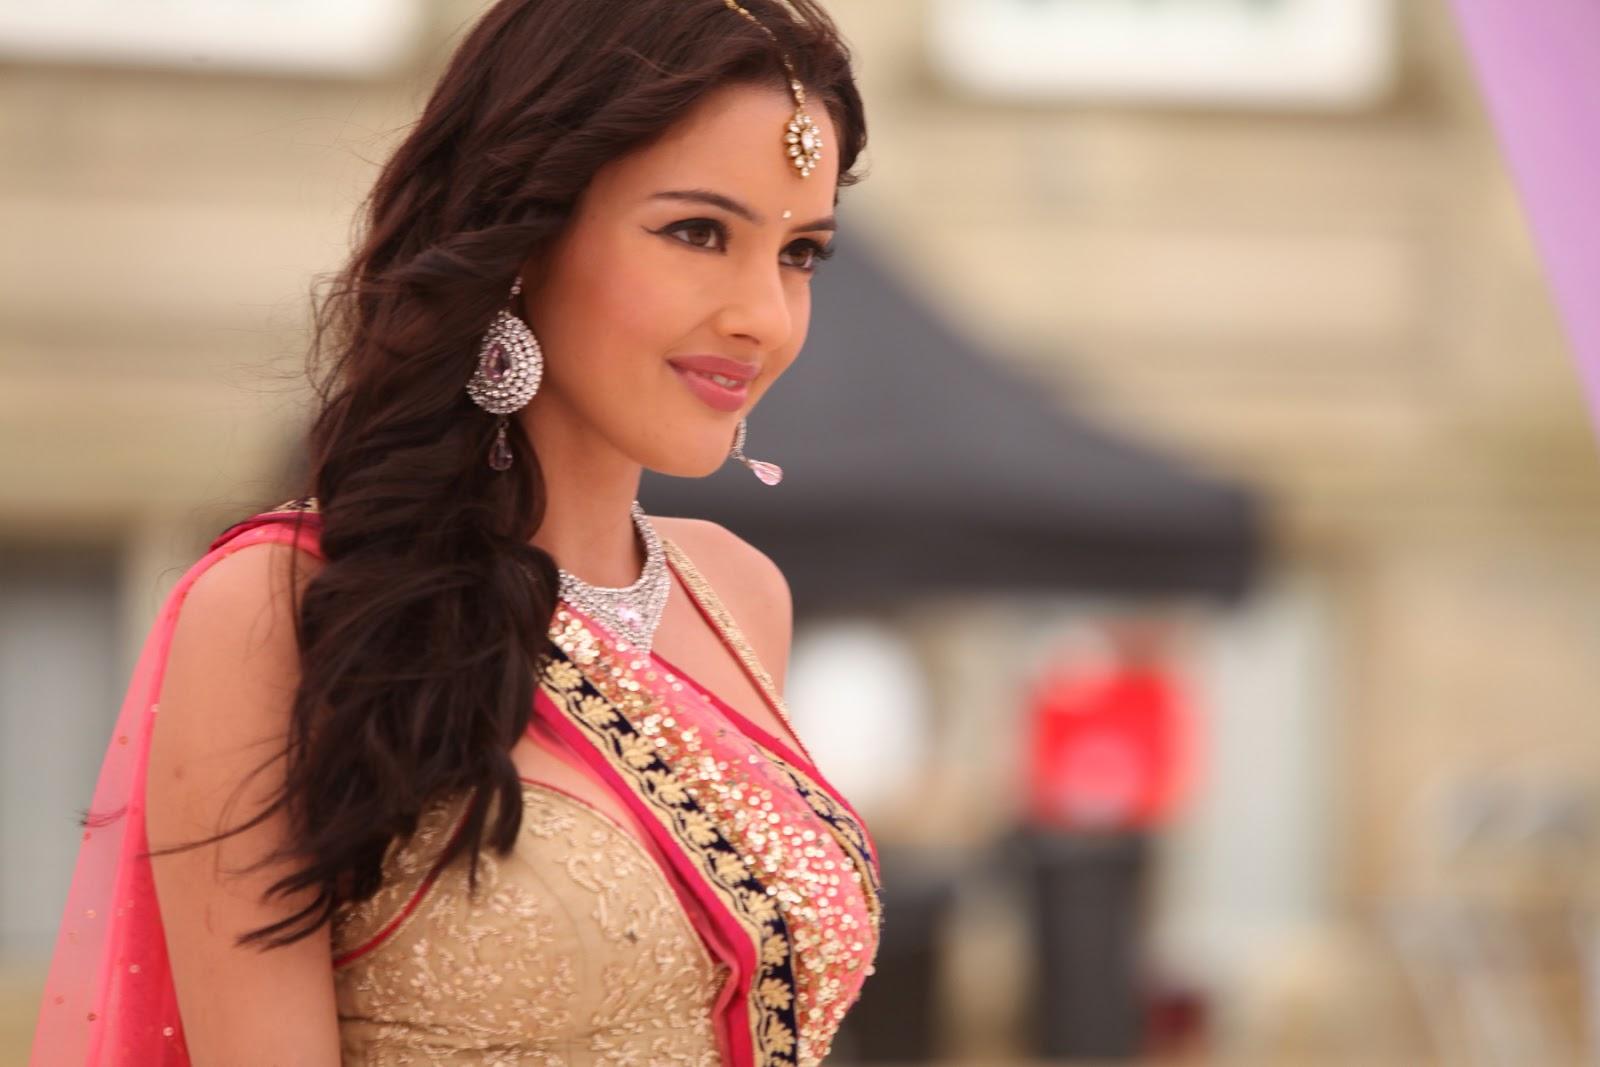 صورة اجمل الهنديات , اروع صور بنات هنديات جميلات 4422 2